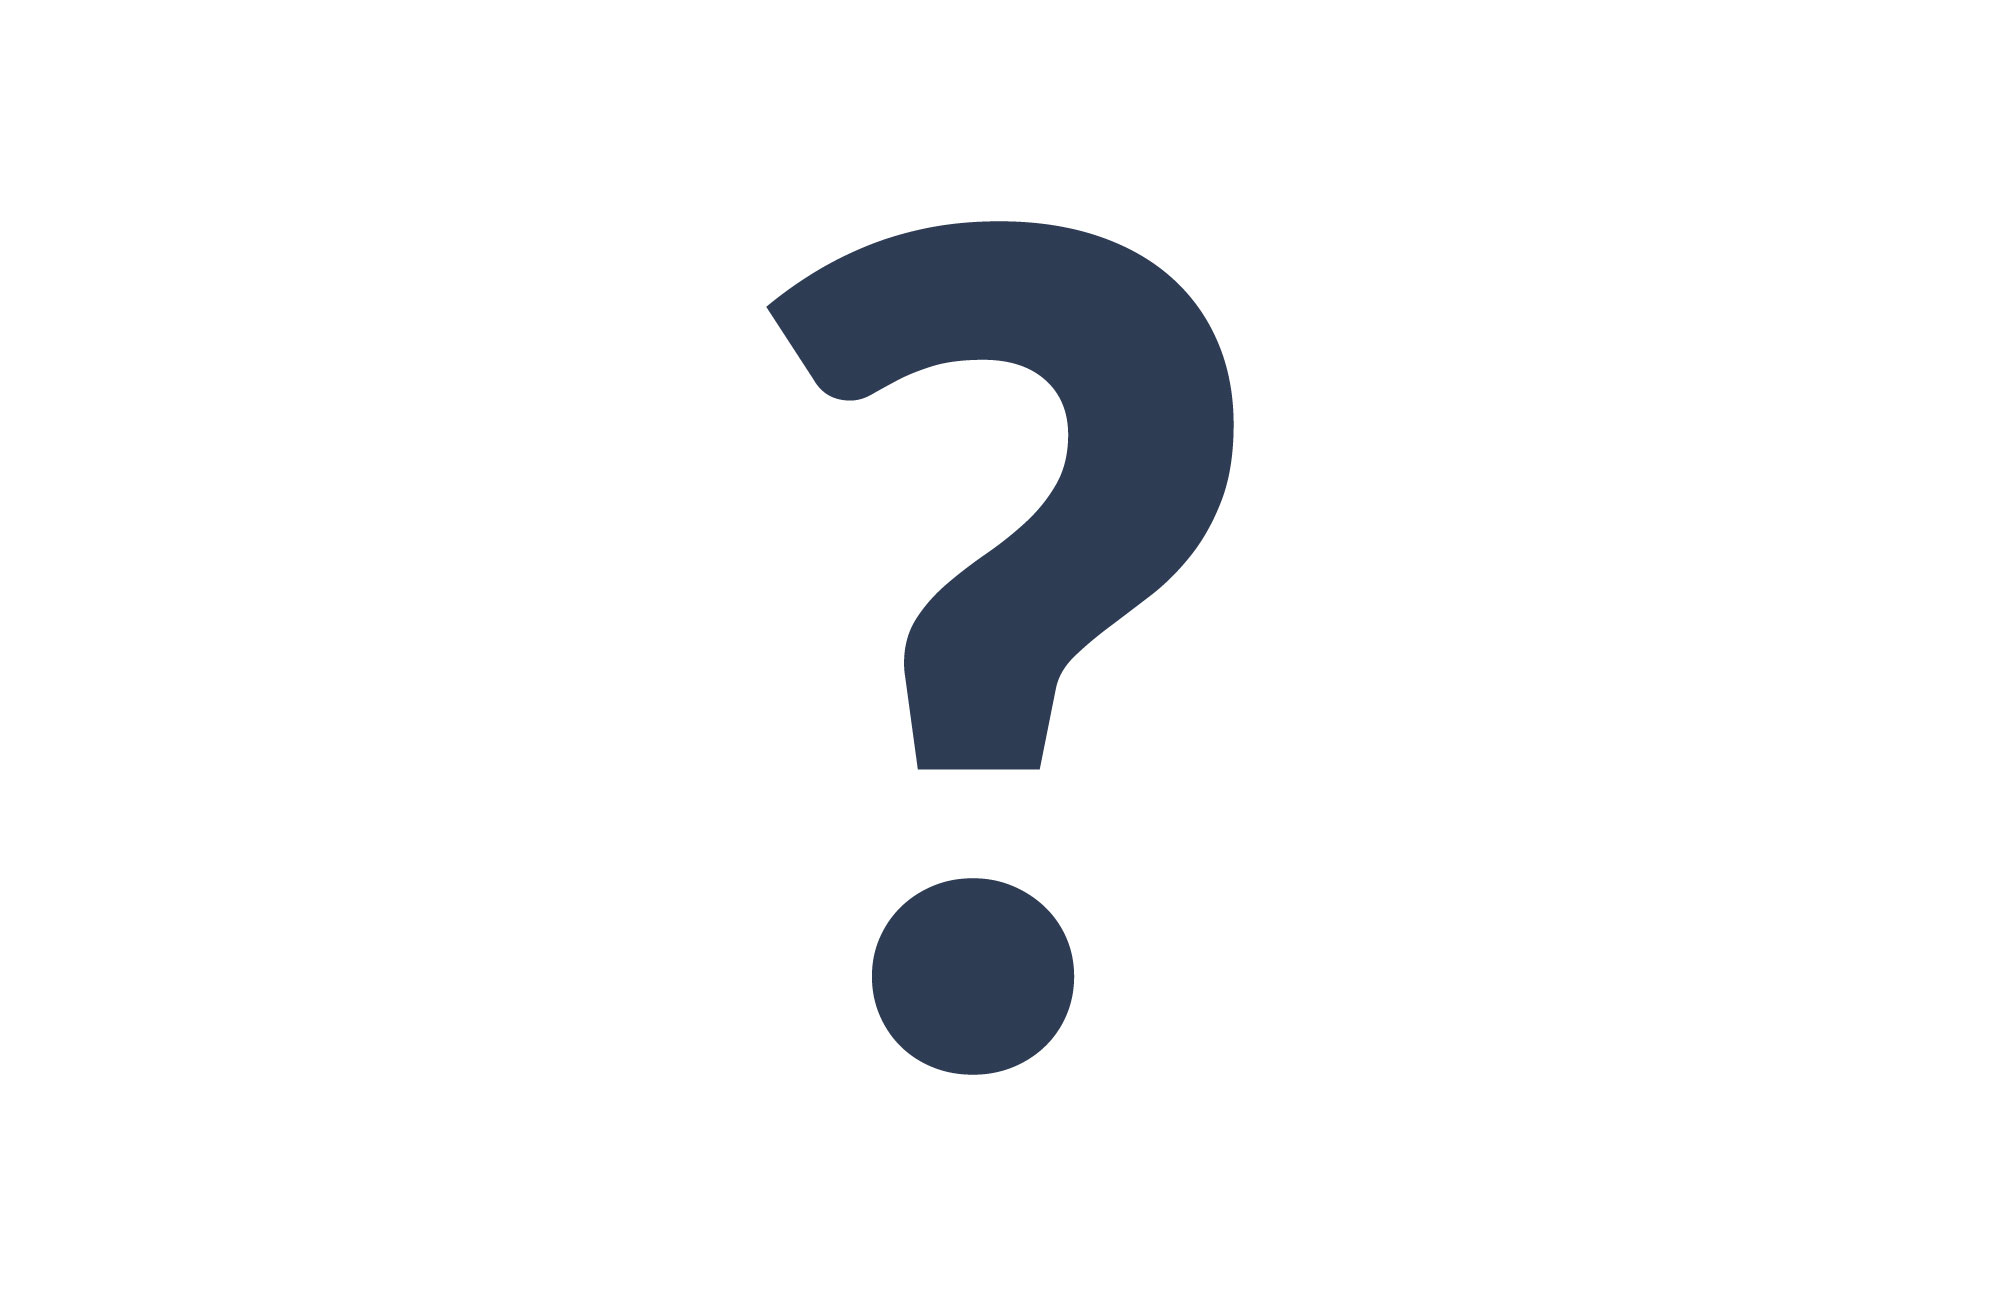 question_1